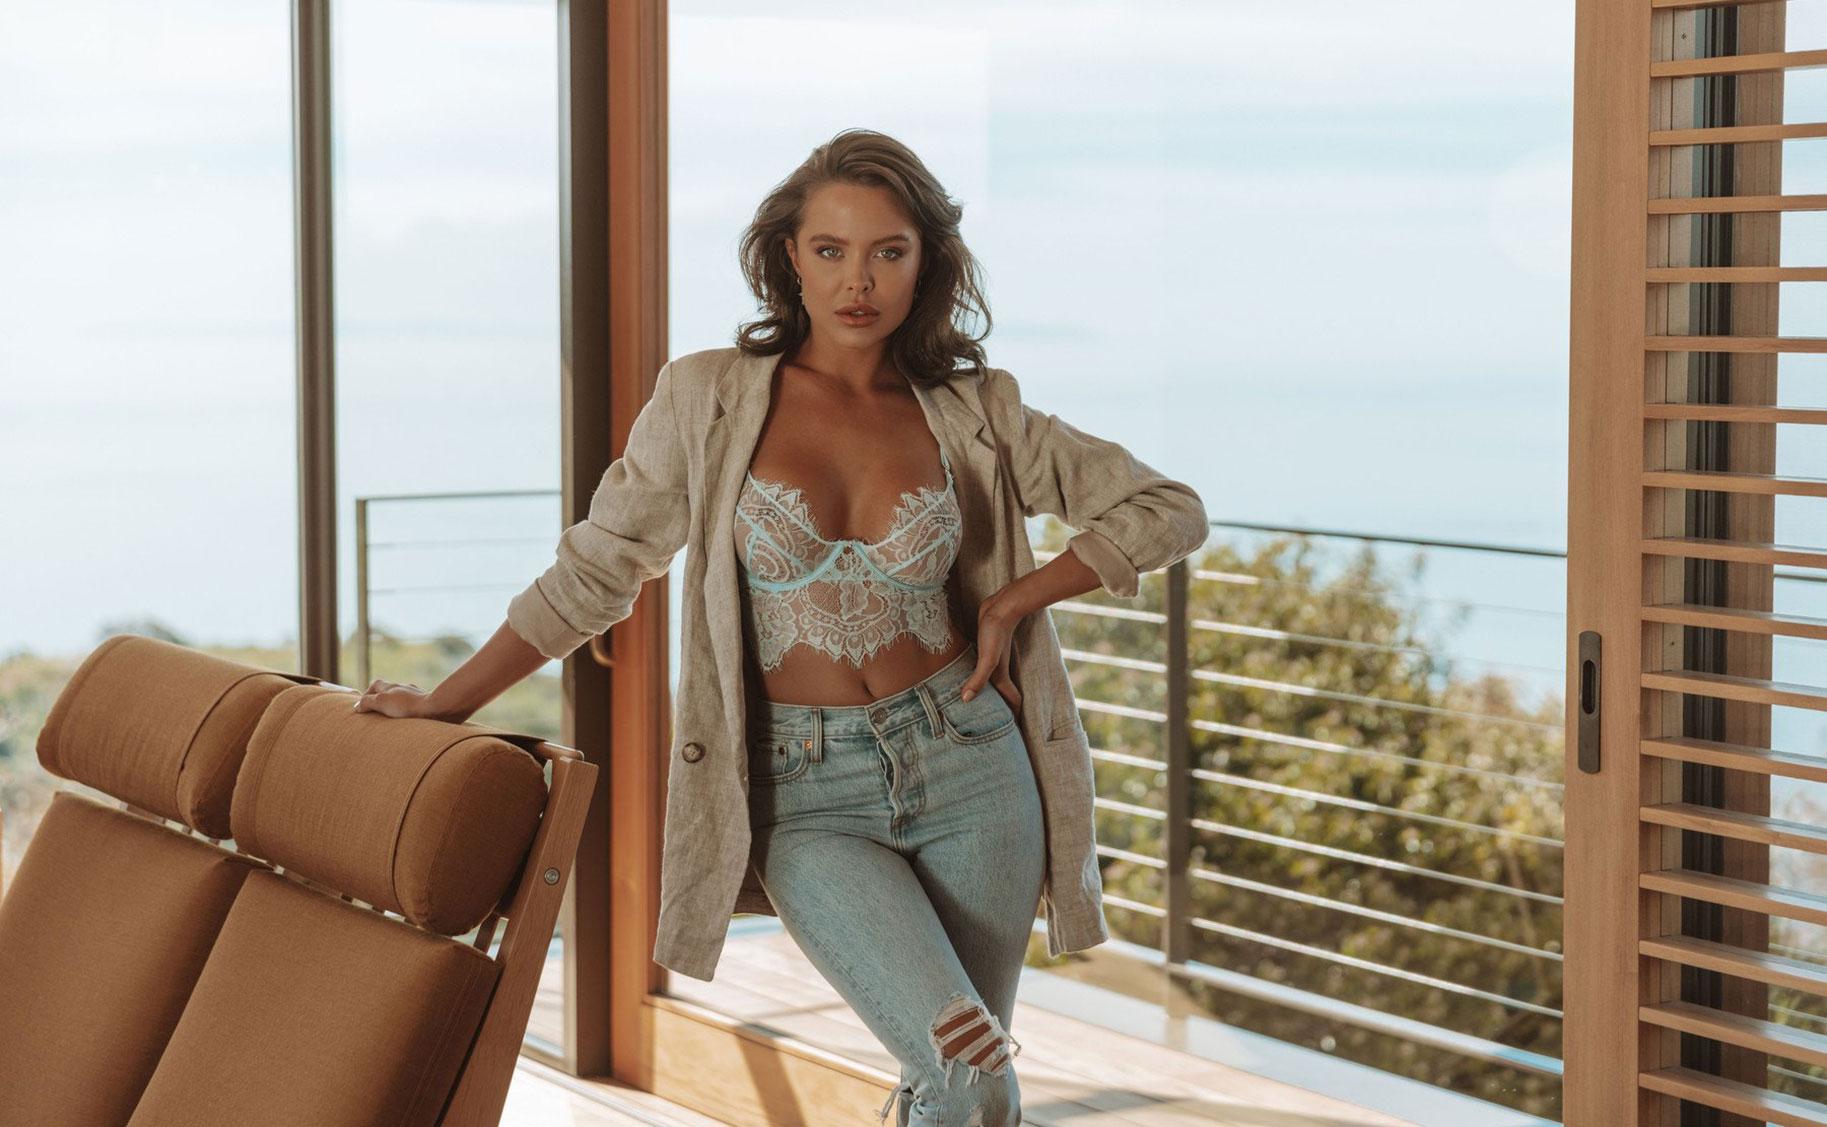 Мара Тиген в нижнем белье и купальниках модного бренда Gooseberry Intimates / фото 16